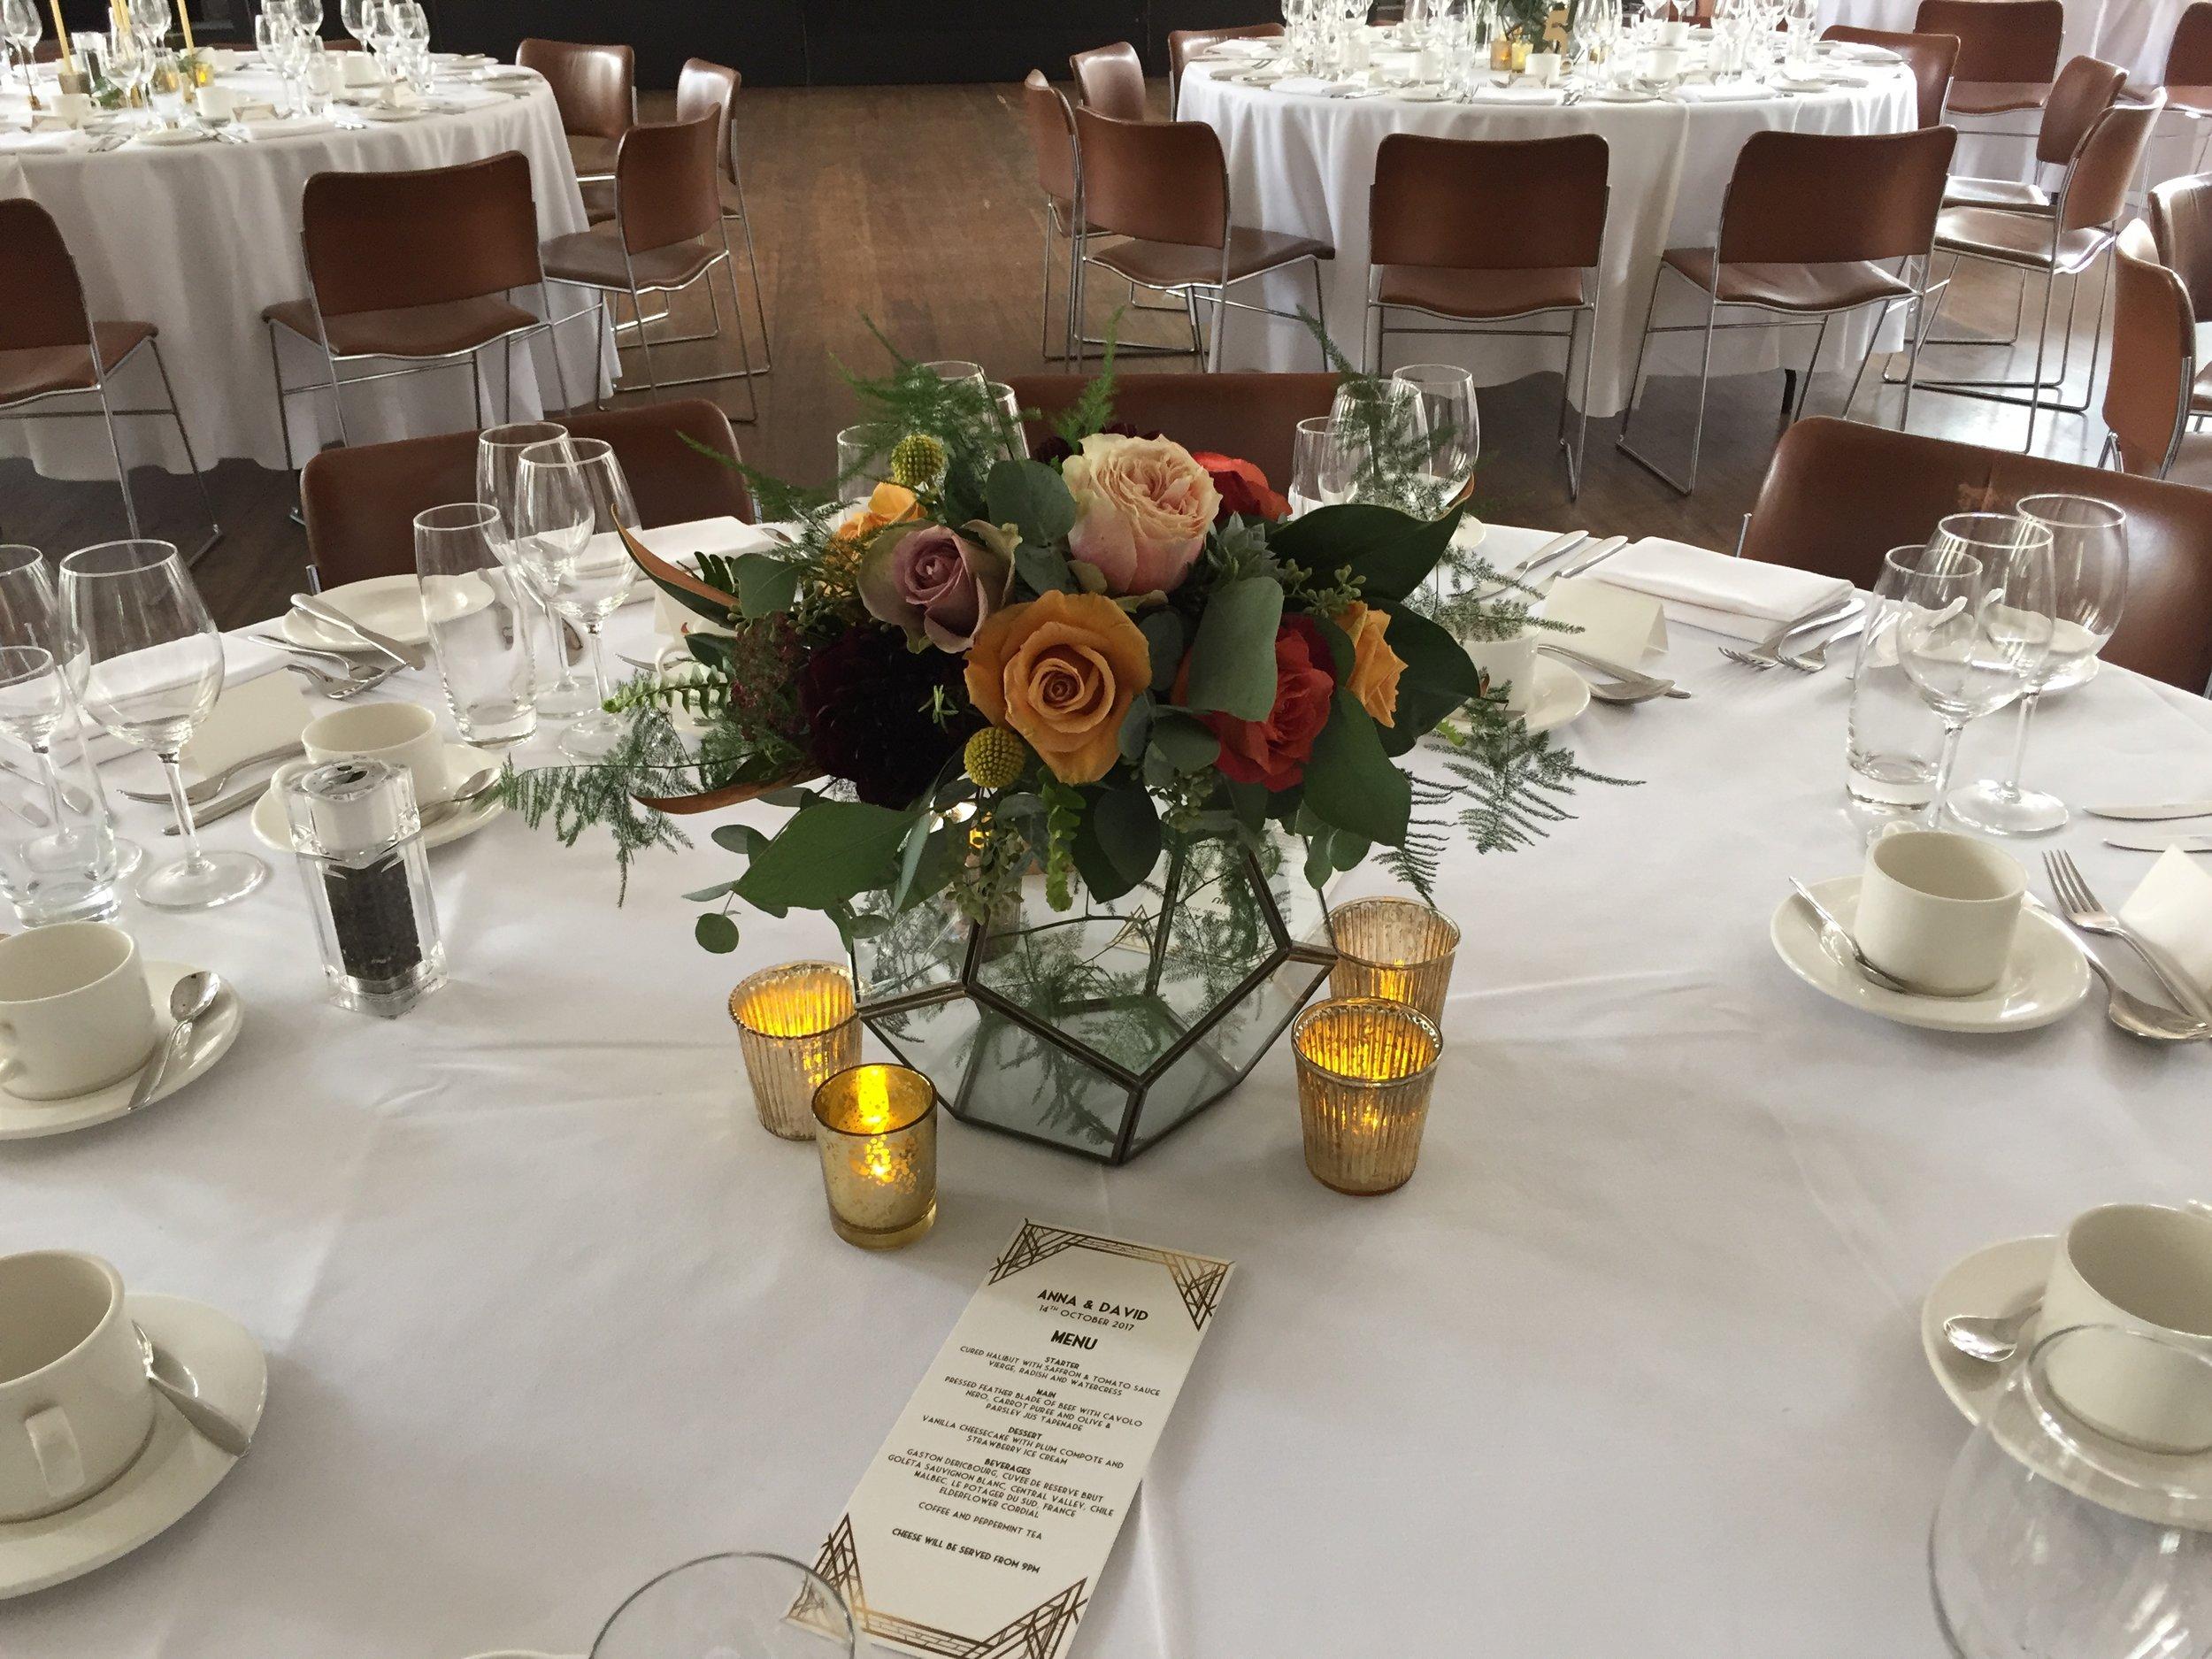 Vase hire love blooms wedding flowers london event flowers gold brass edged terrarium x 7 availablenbsp w 27cm x l 27cm x h 21cm although junglespirit Gallery